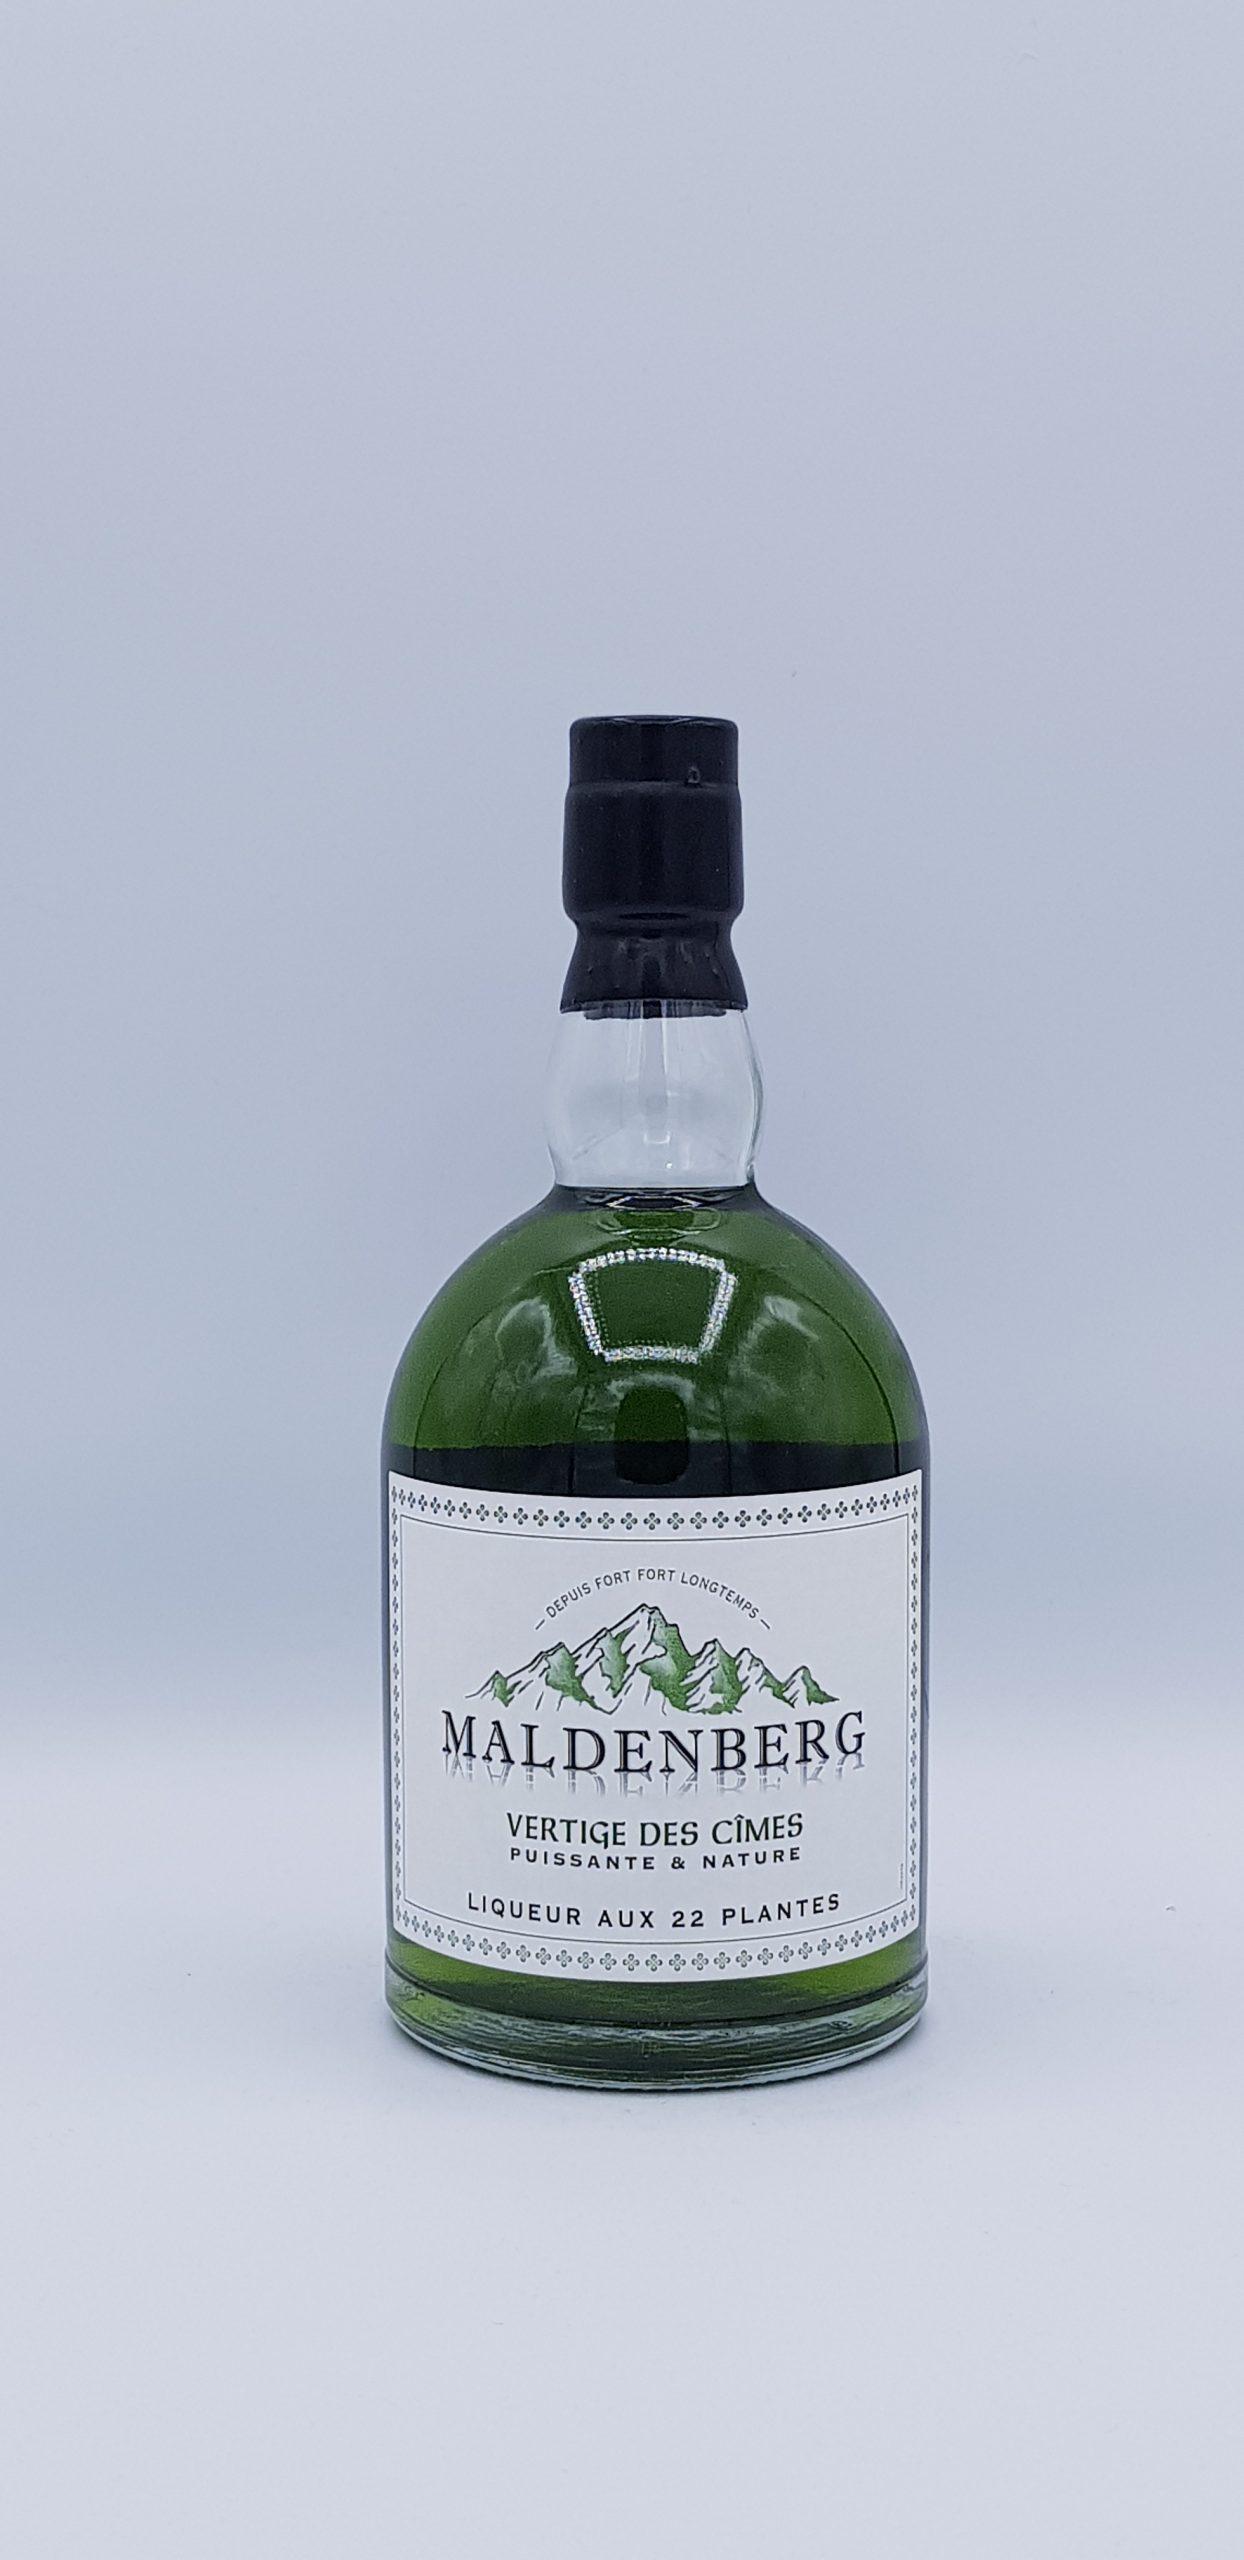 Maldenberg Vertige des Cîmes  70 cl 49.9 %